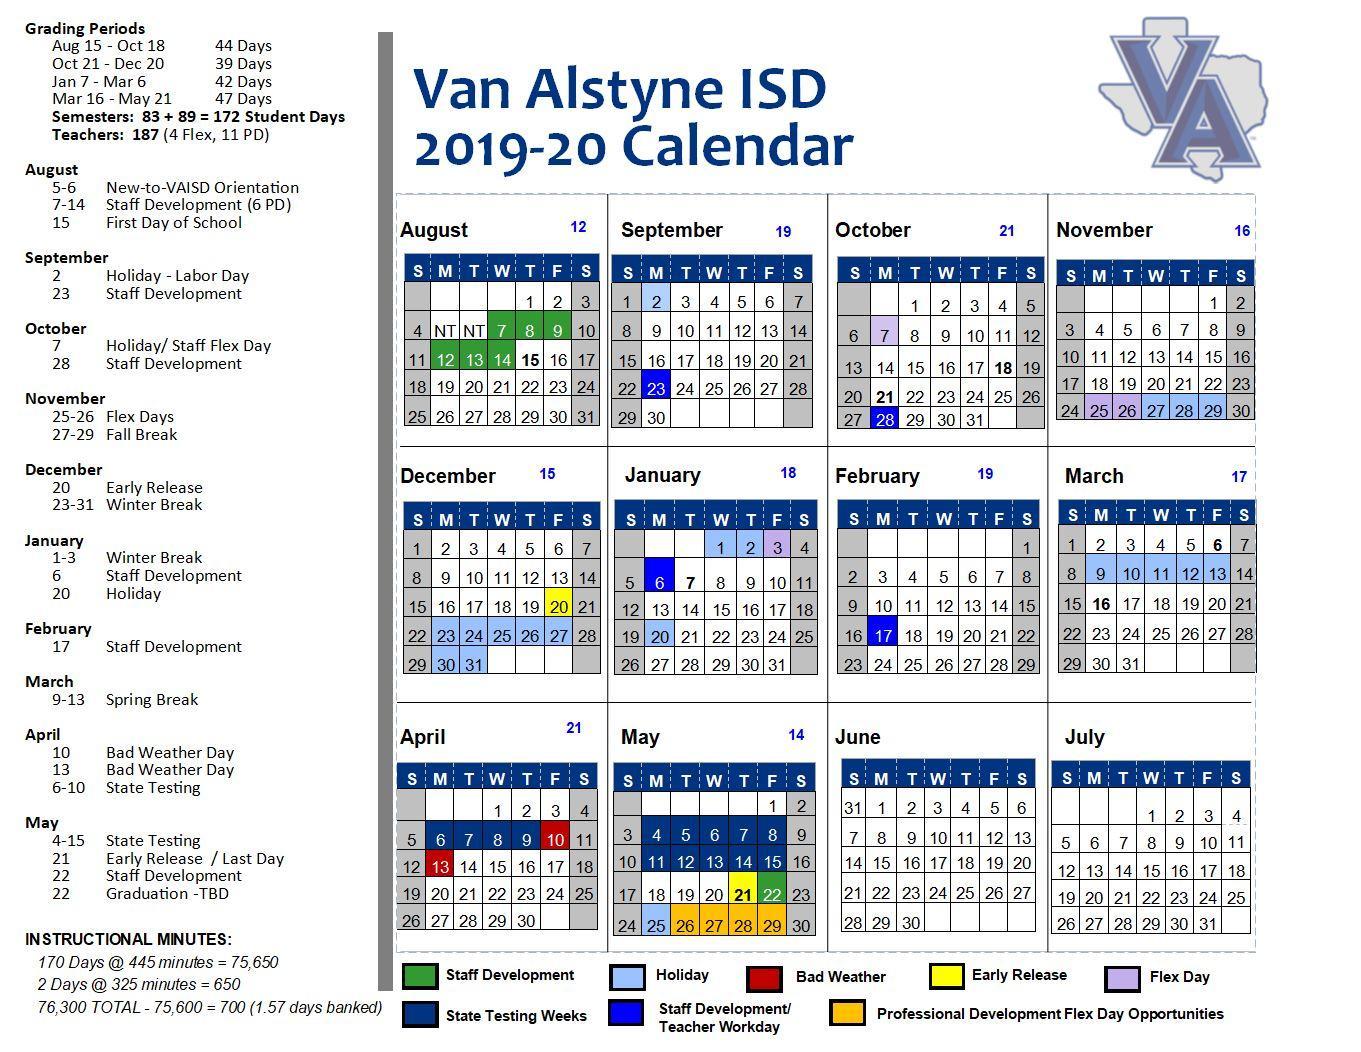 Dc Calendar February 4 2020 School Calendars – Links Box – Van Alstyne ISD